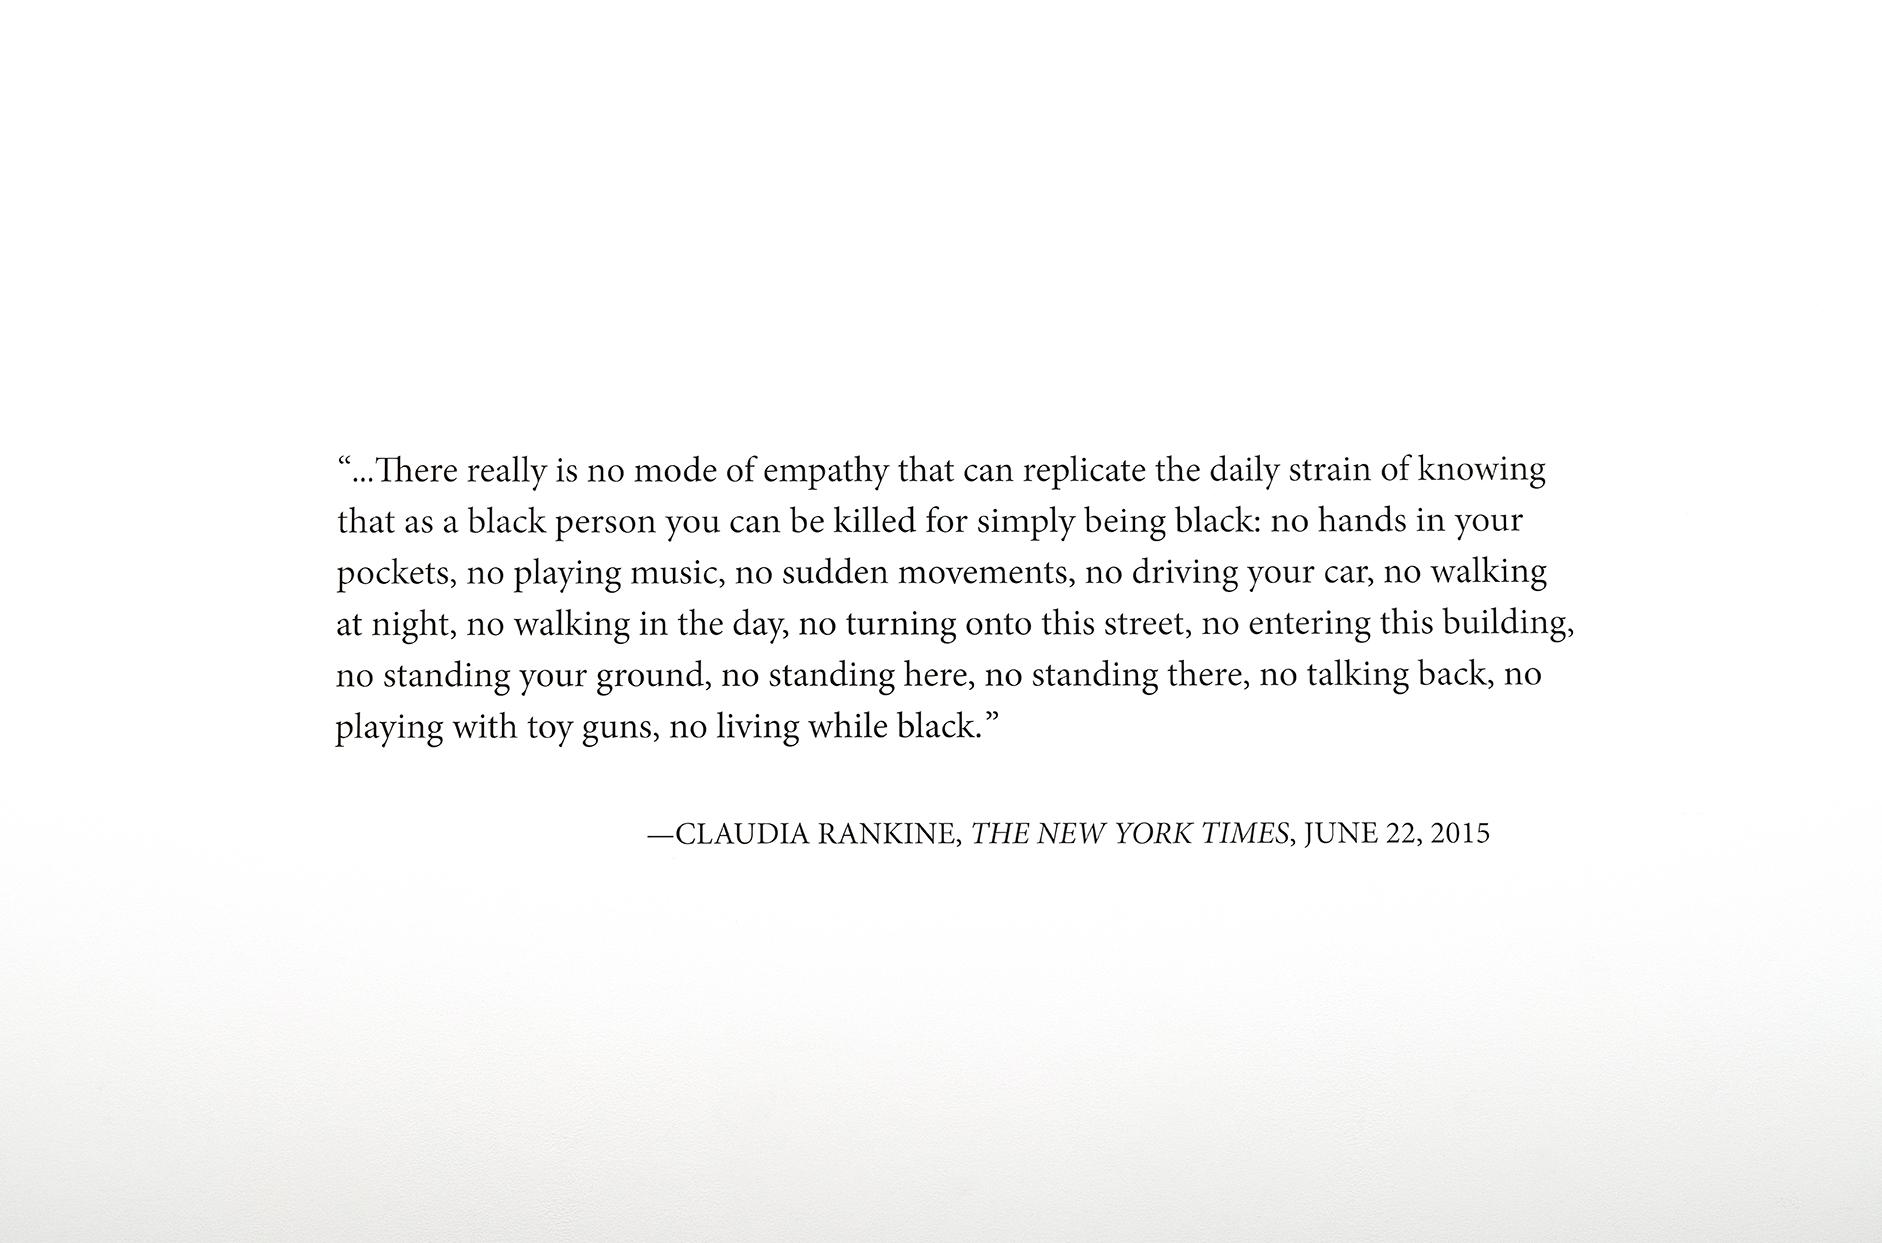 claudia-rankine-words